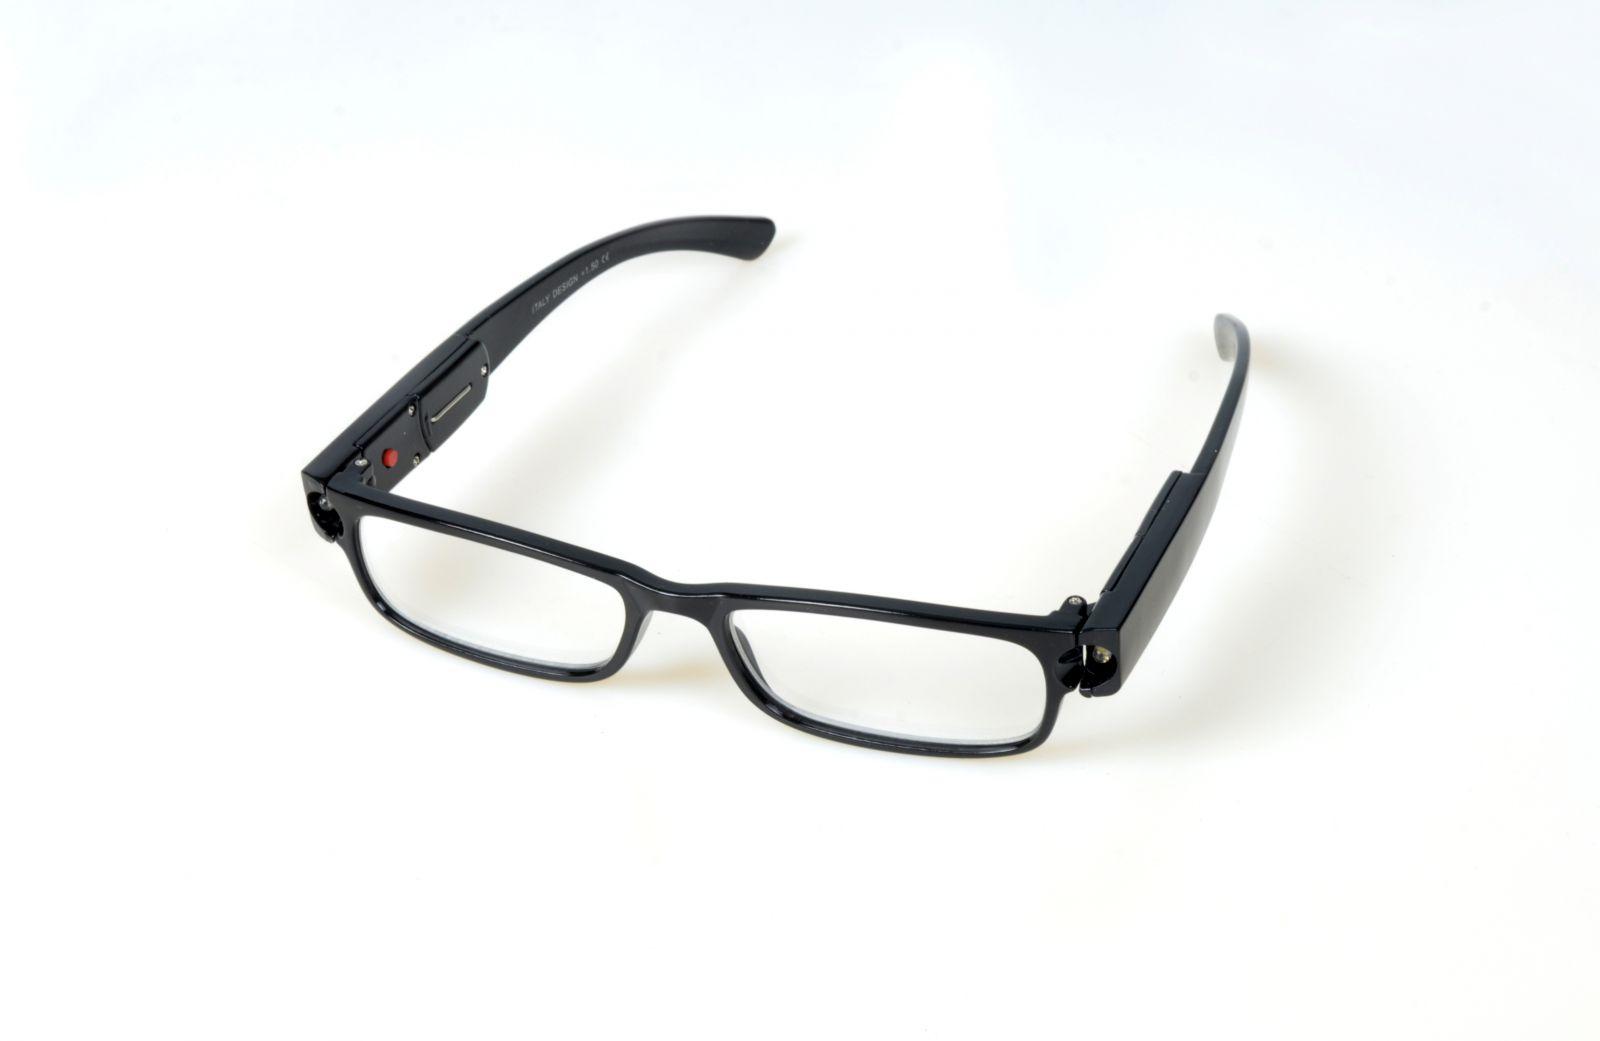 Dioptrické brýle se světýlkama +1,00